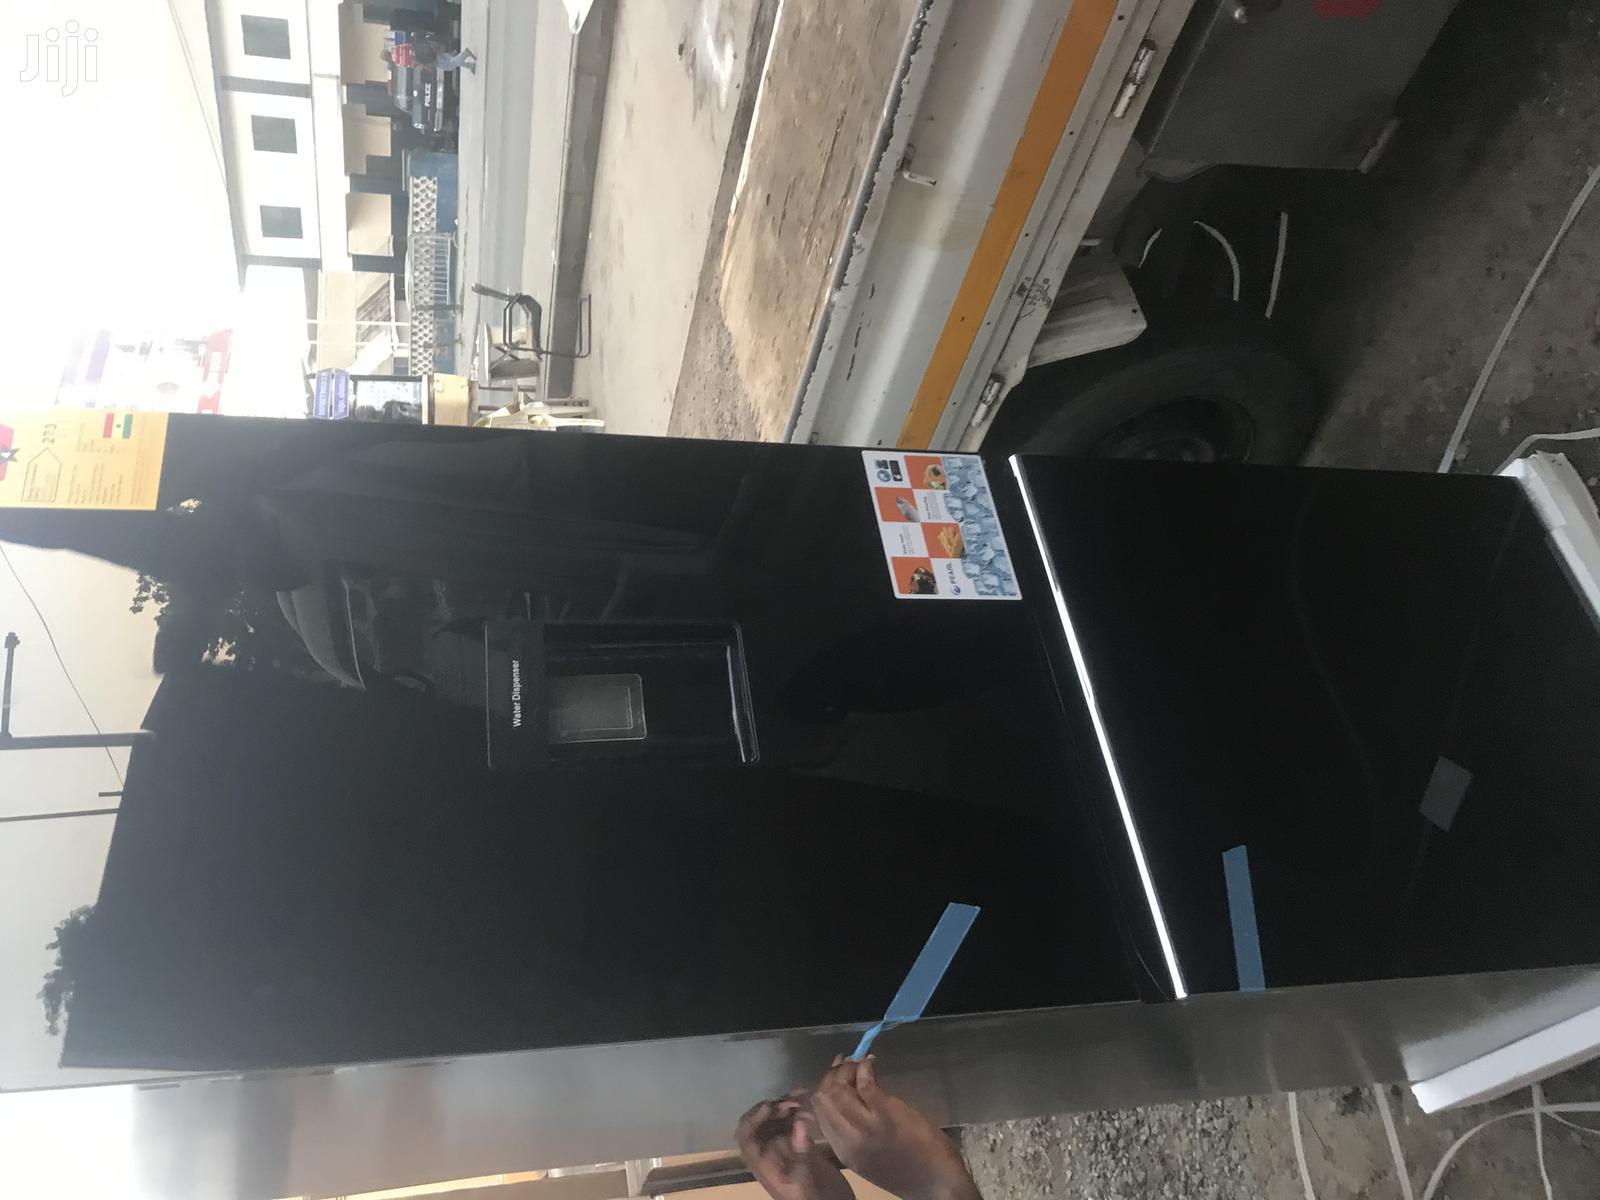 Water Dispenser Pearl 309L Bottom Freezer Refrigerator(Black)PF-400bg   Kitchen Appliances for sale in Adabraka, Greater Accra, Ghana